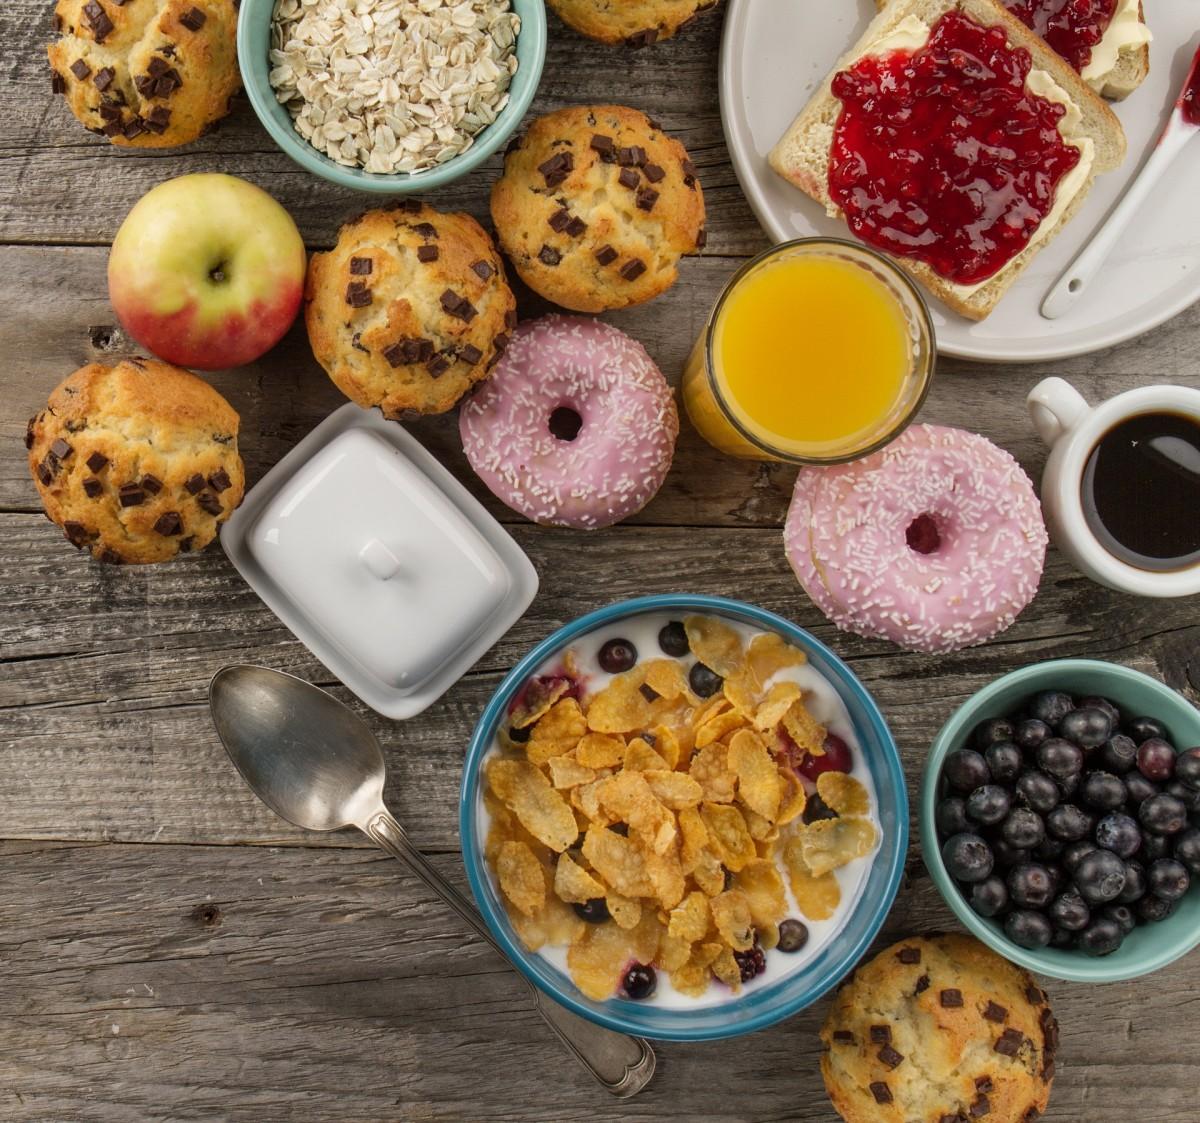 Rompecabezas Recoger rompecabezas en línea - Breakfast